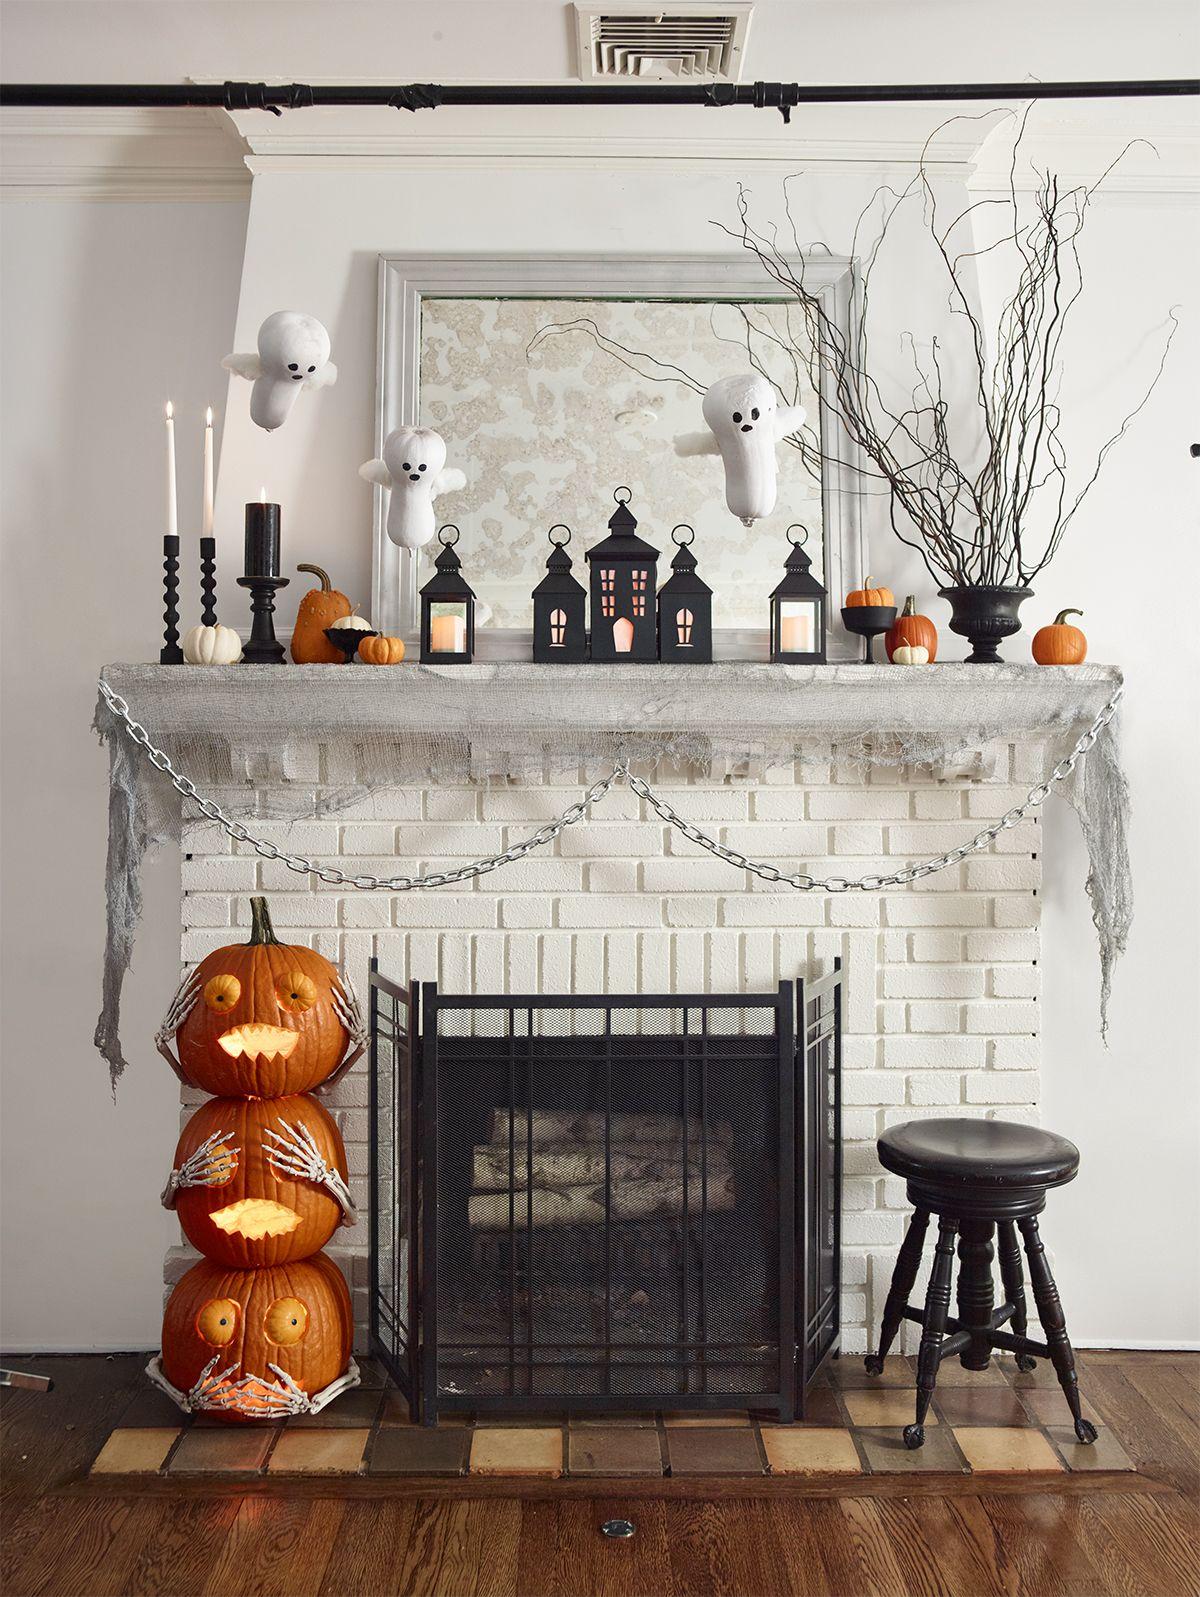 50 DIY Halloween Decorations , How to Make Halloween Decorations